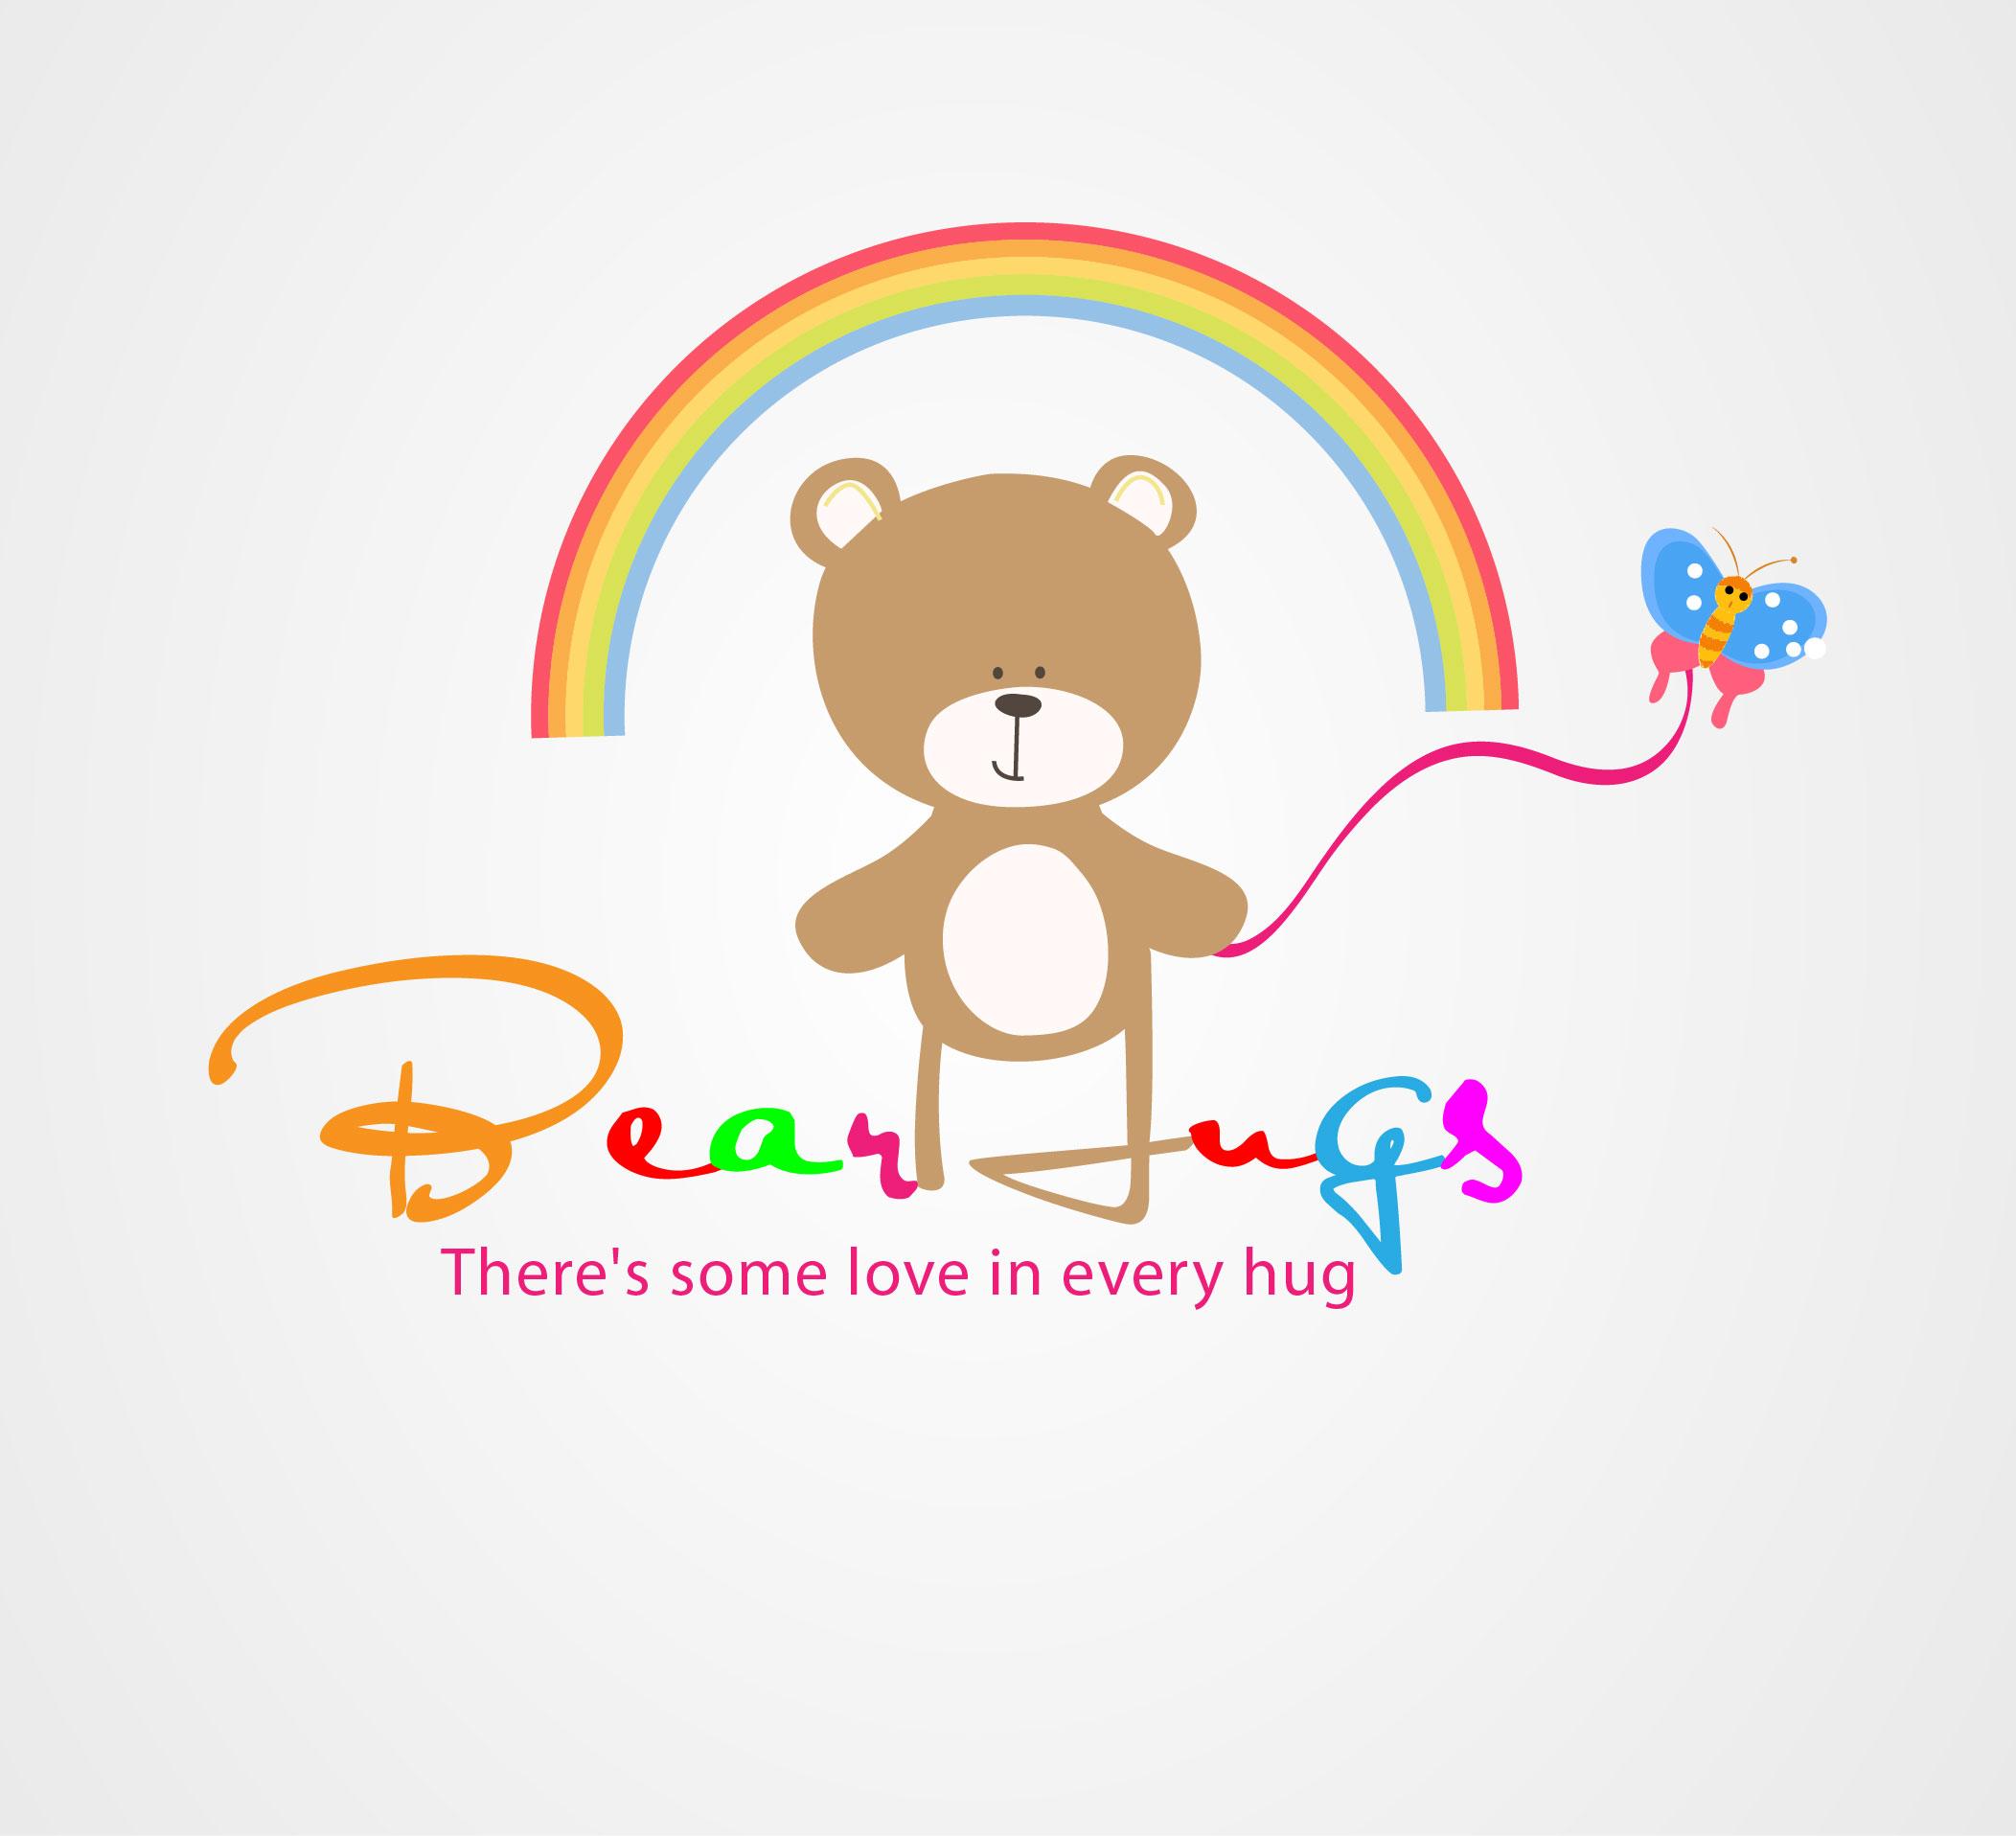 Logo Design by Darina Dimitrova - Entry No. 54 in the Logo Design Contest Inspiring Logo Design for BearHugs.